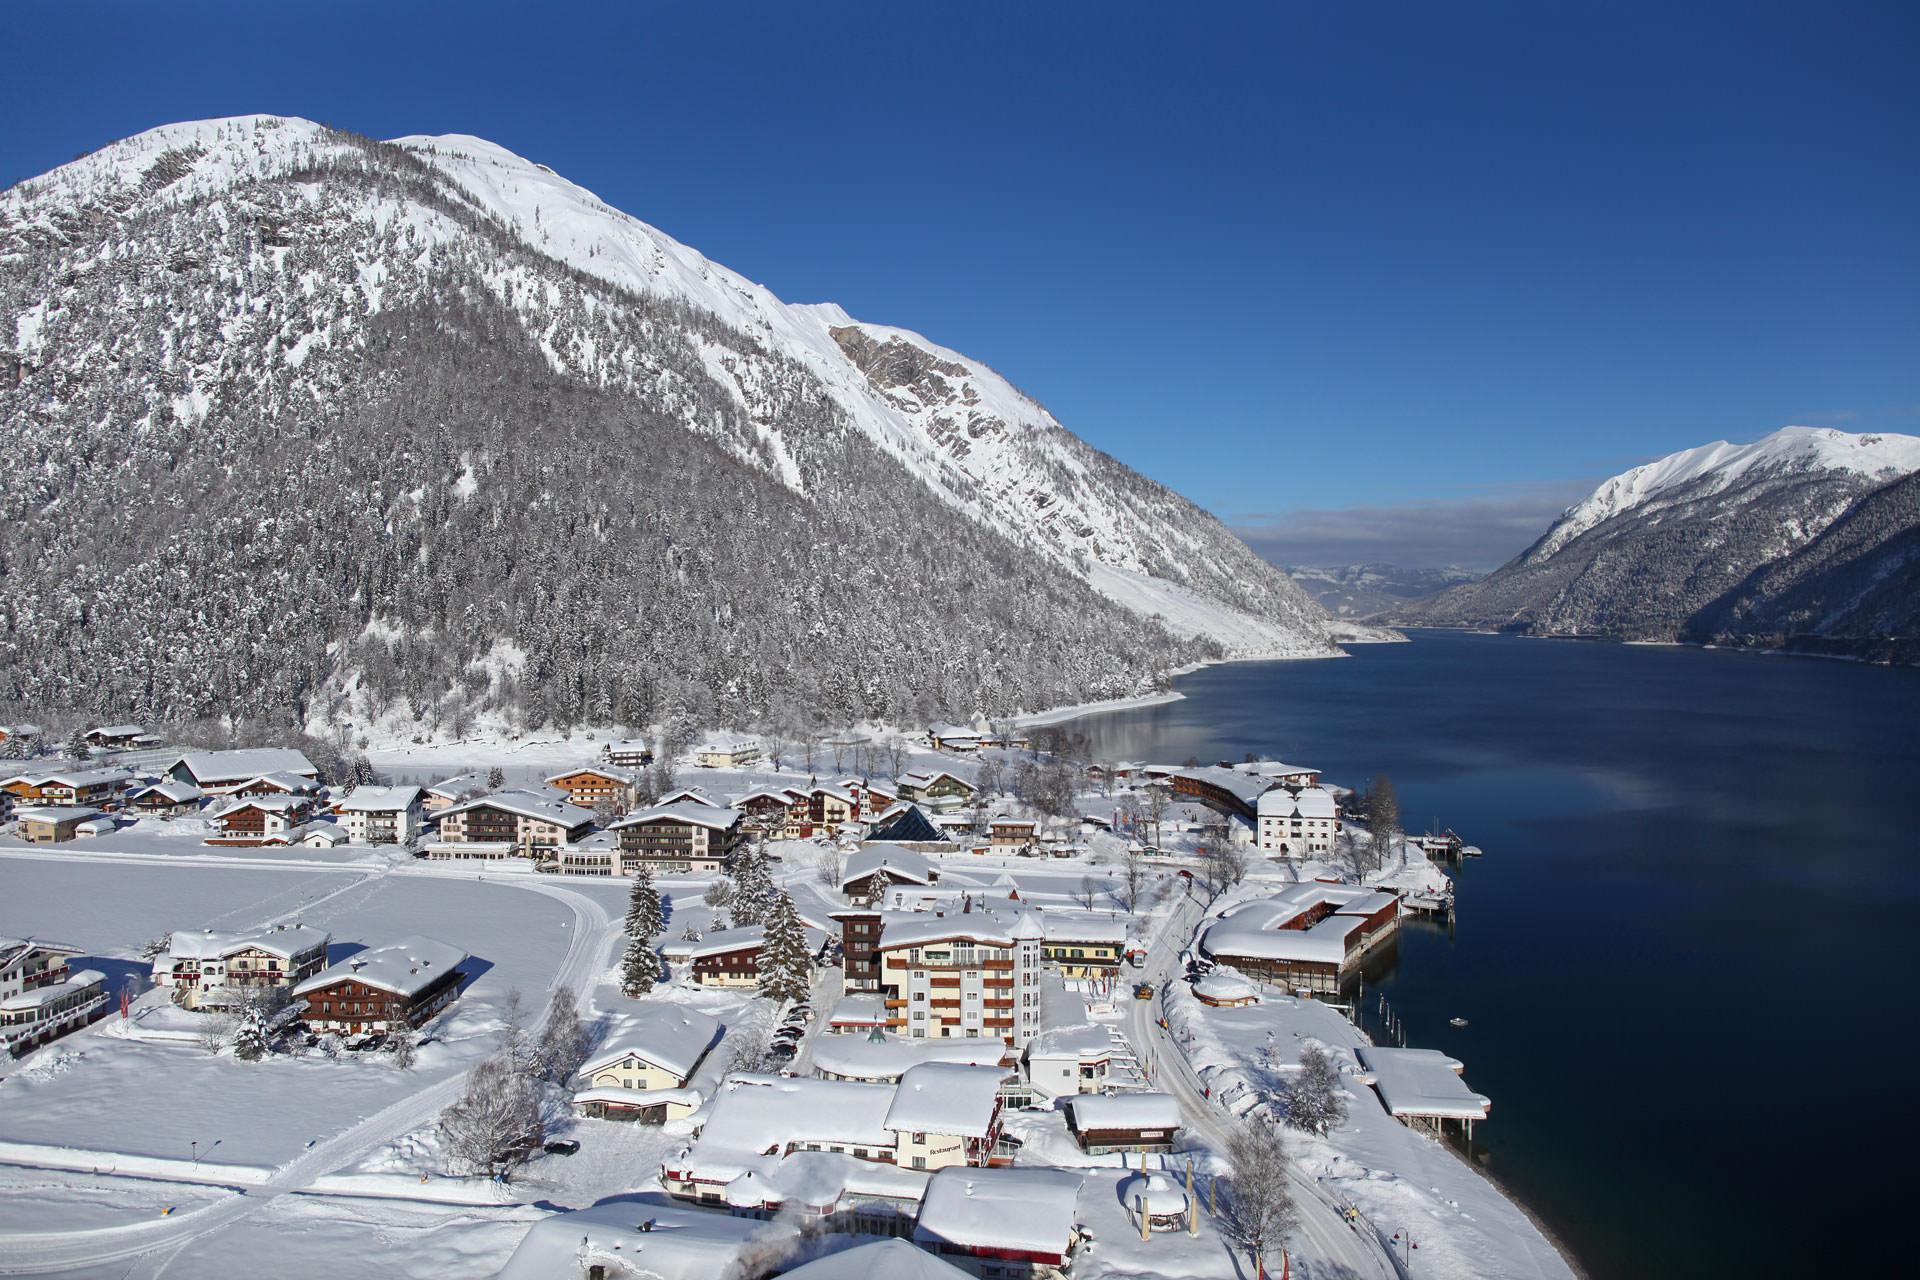 Winter landscape on a lake